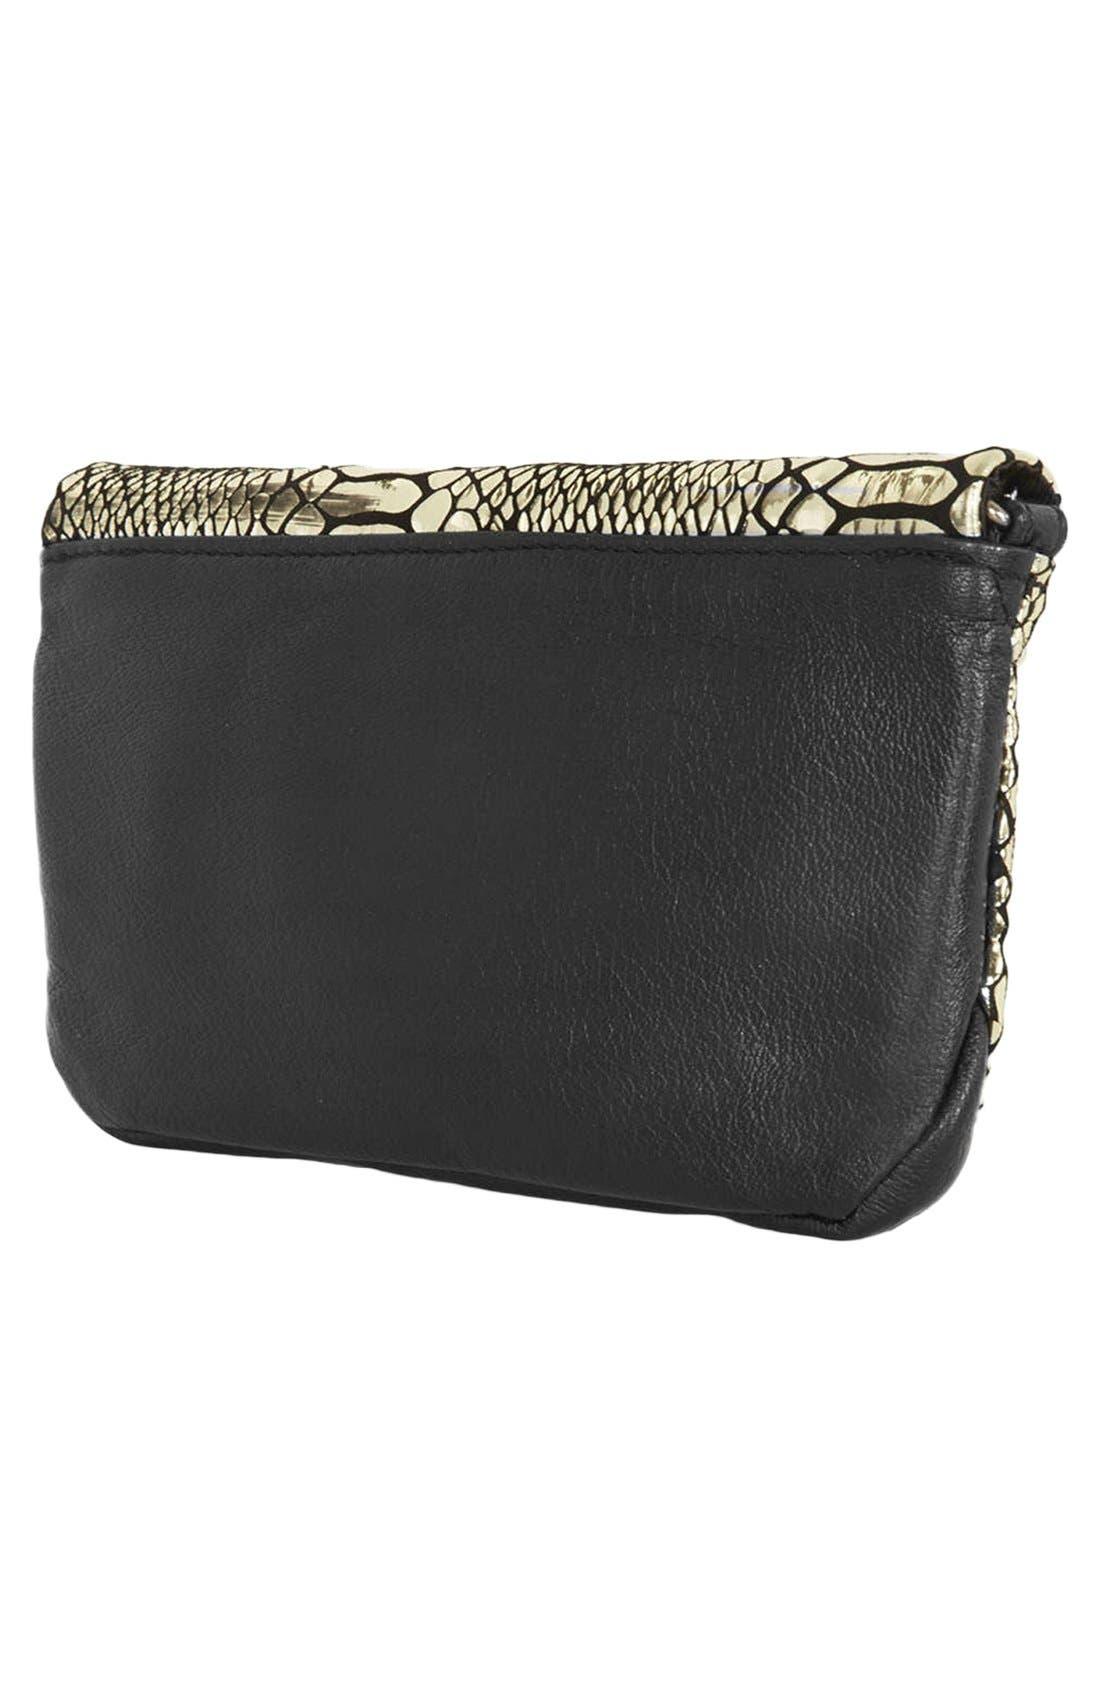 Leather Crossbody Bag,                             Alternate thumbnail 4, color,                             710